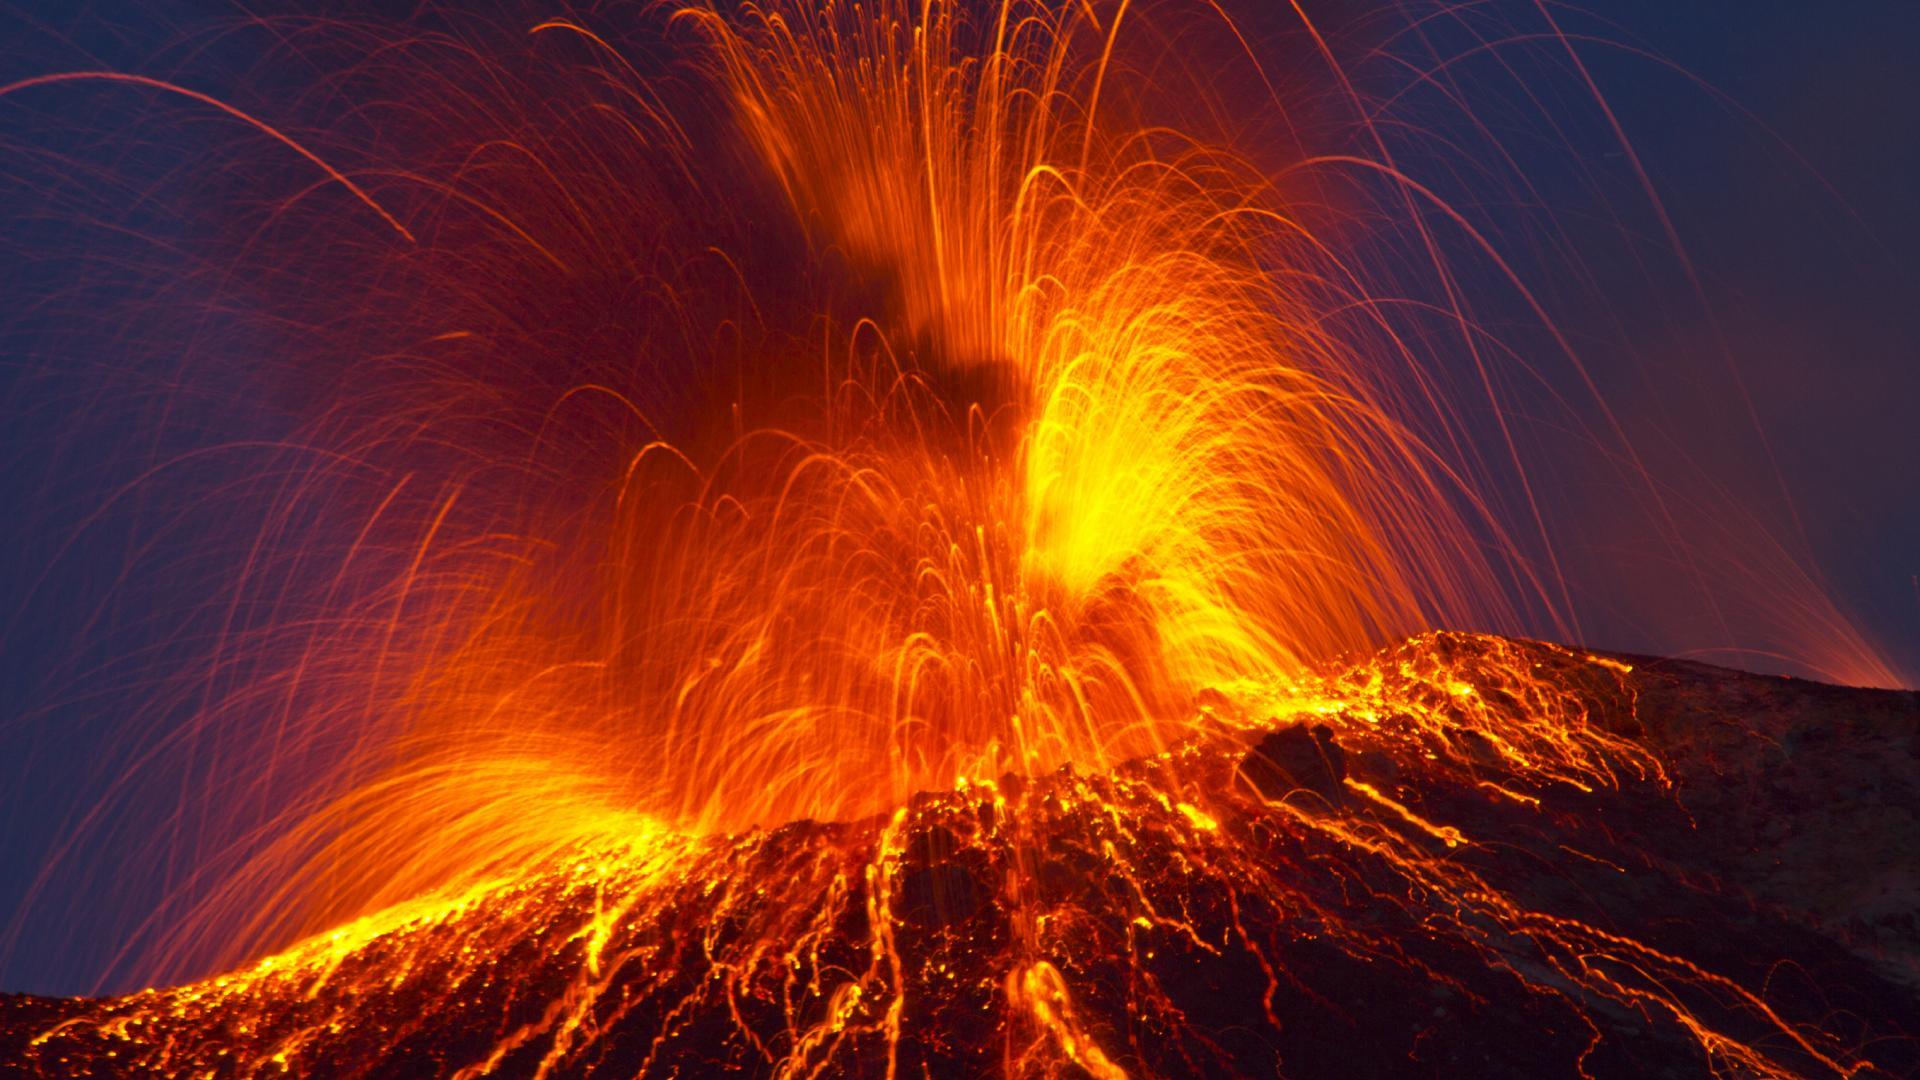 Volcano pic